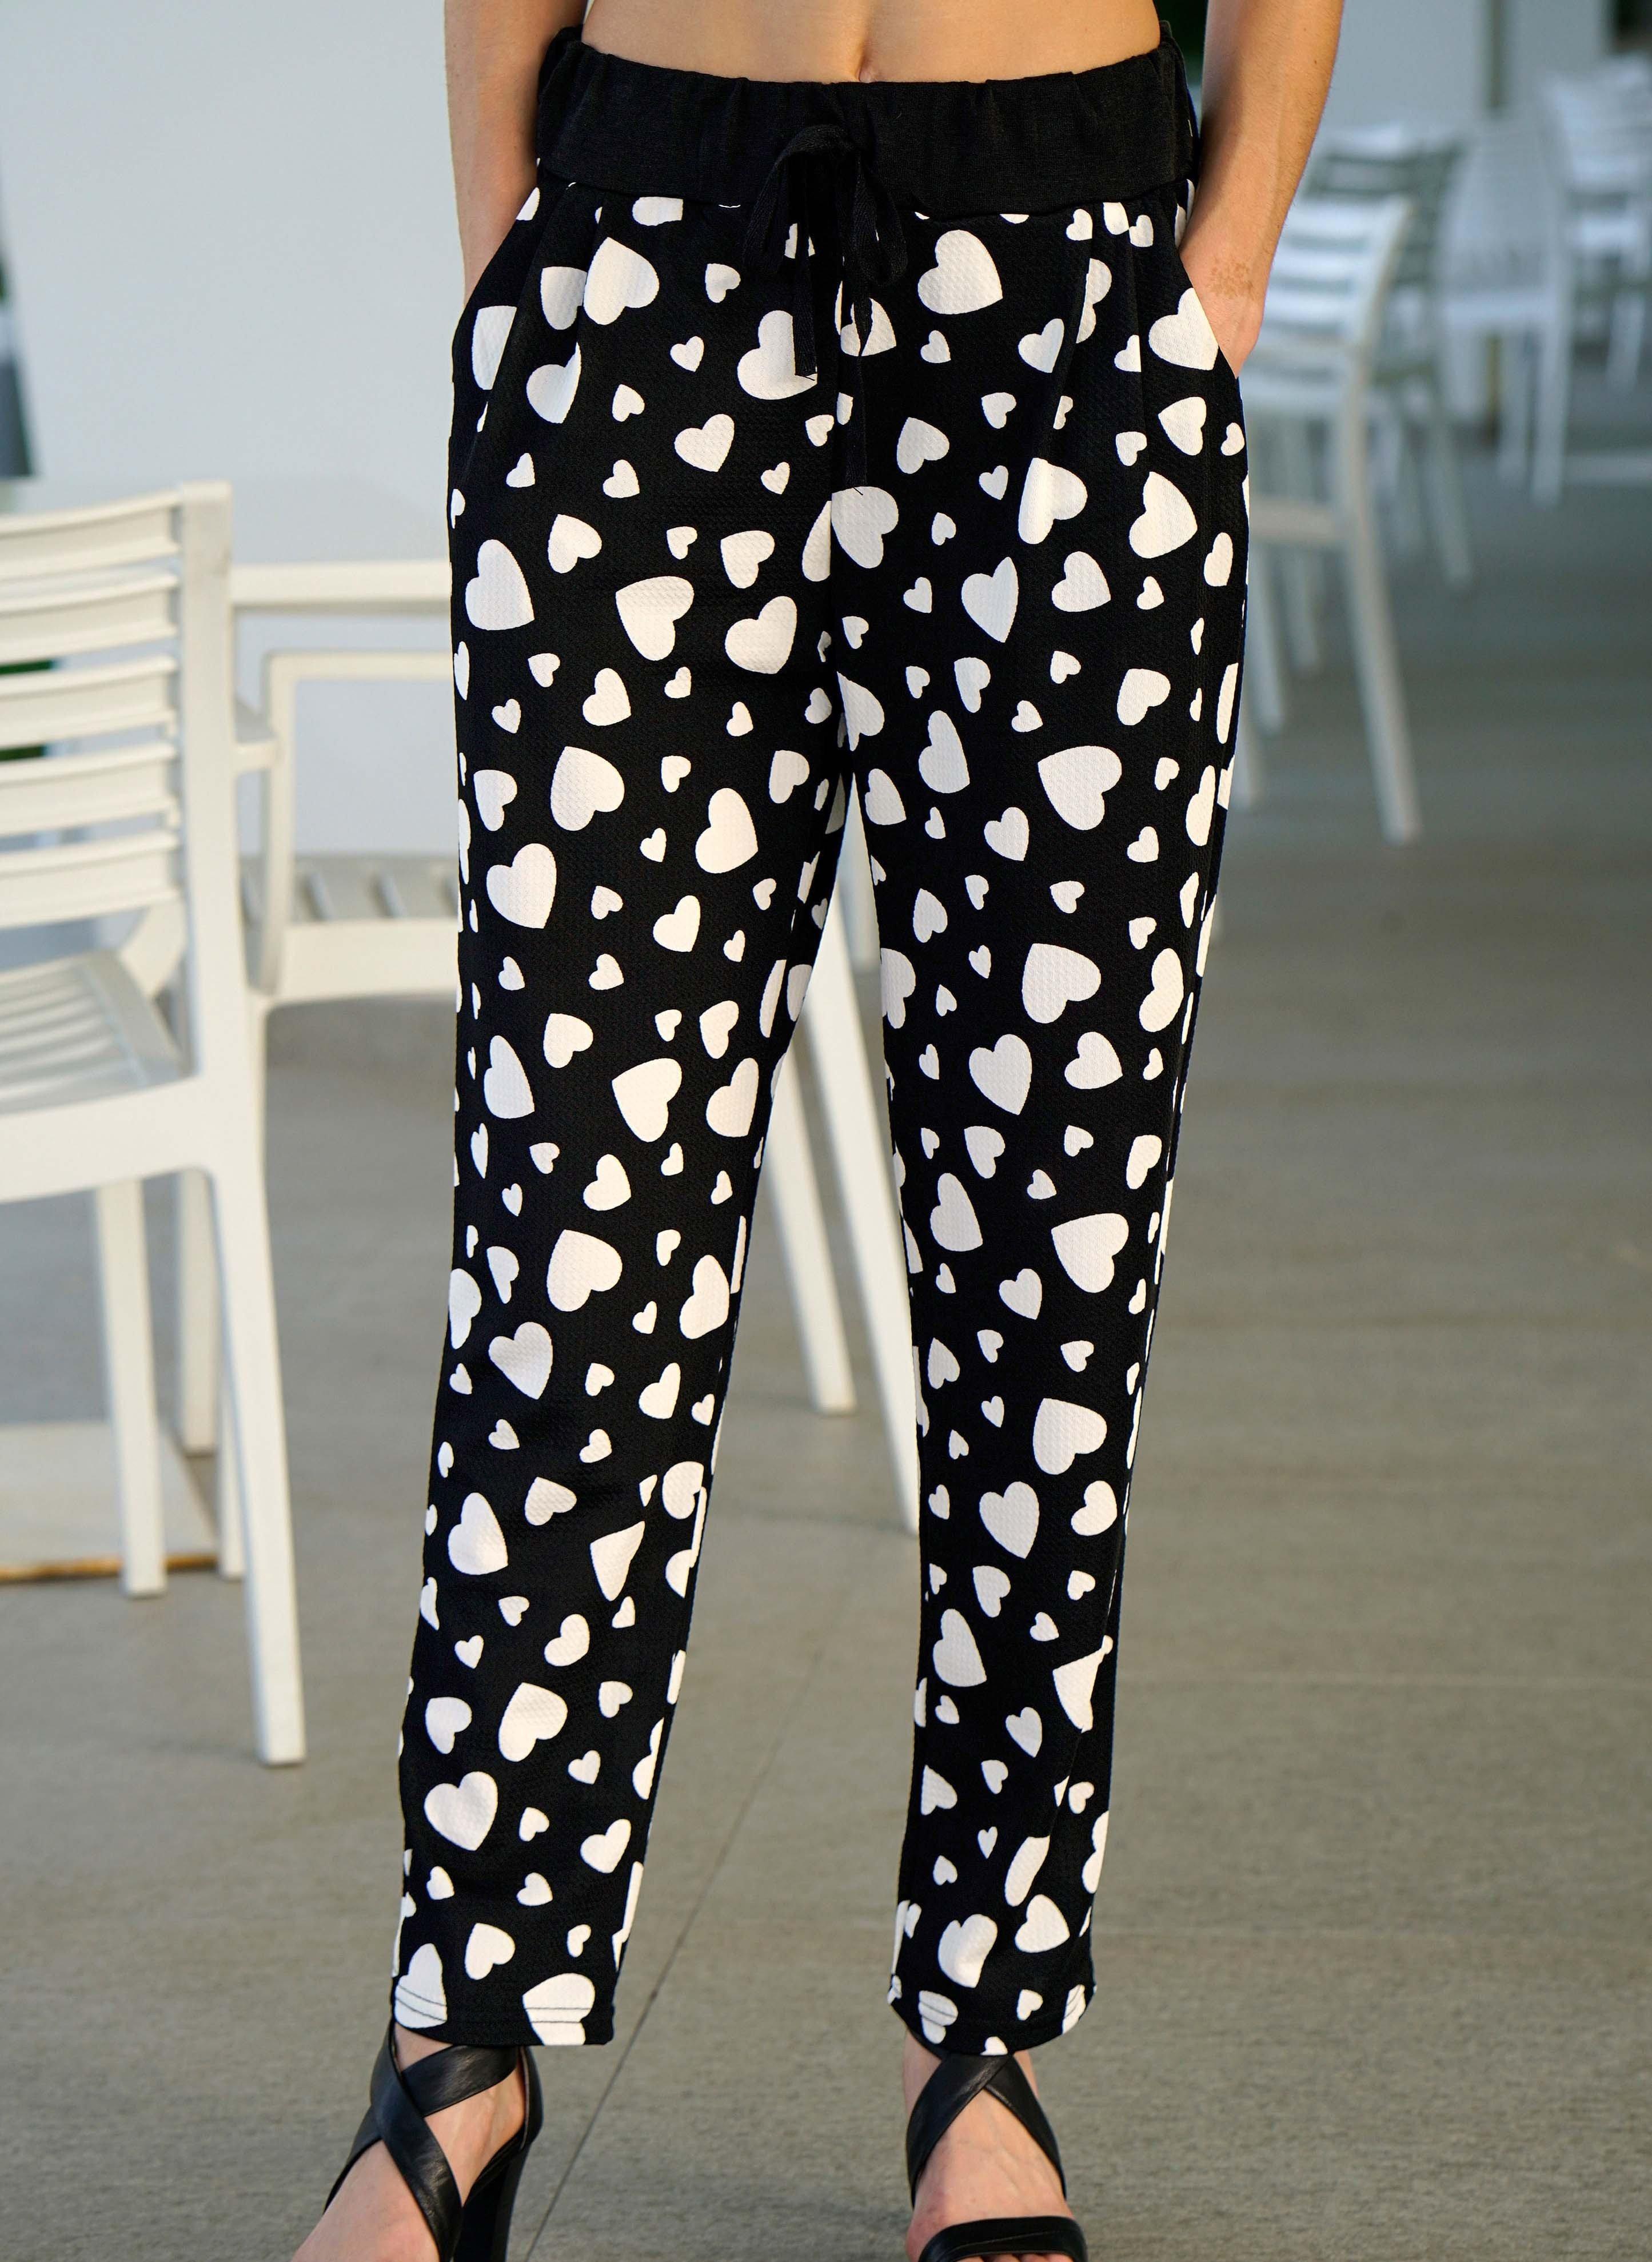 Pantalone, cuori stampati